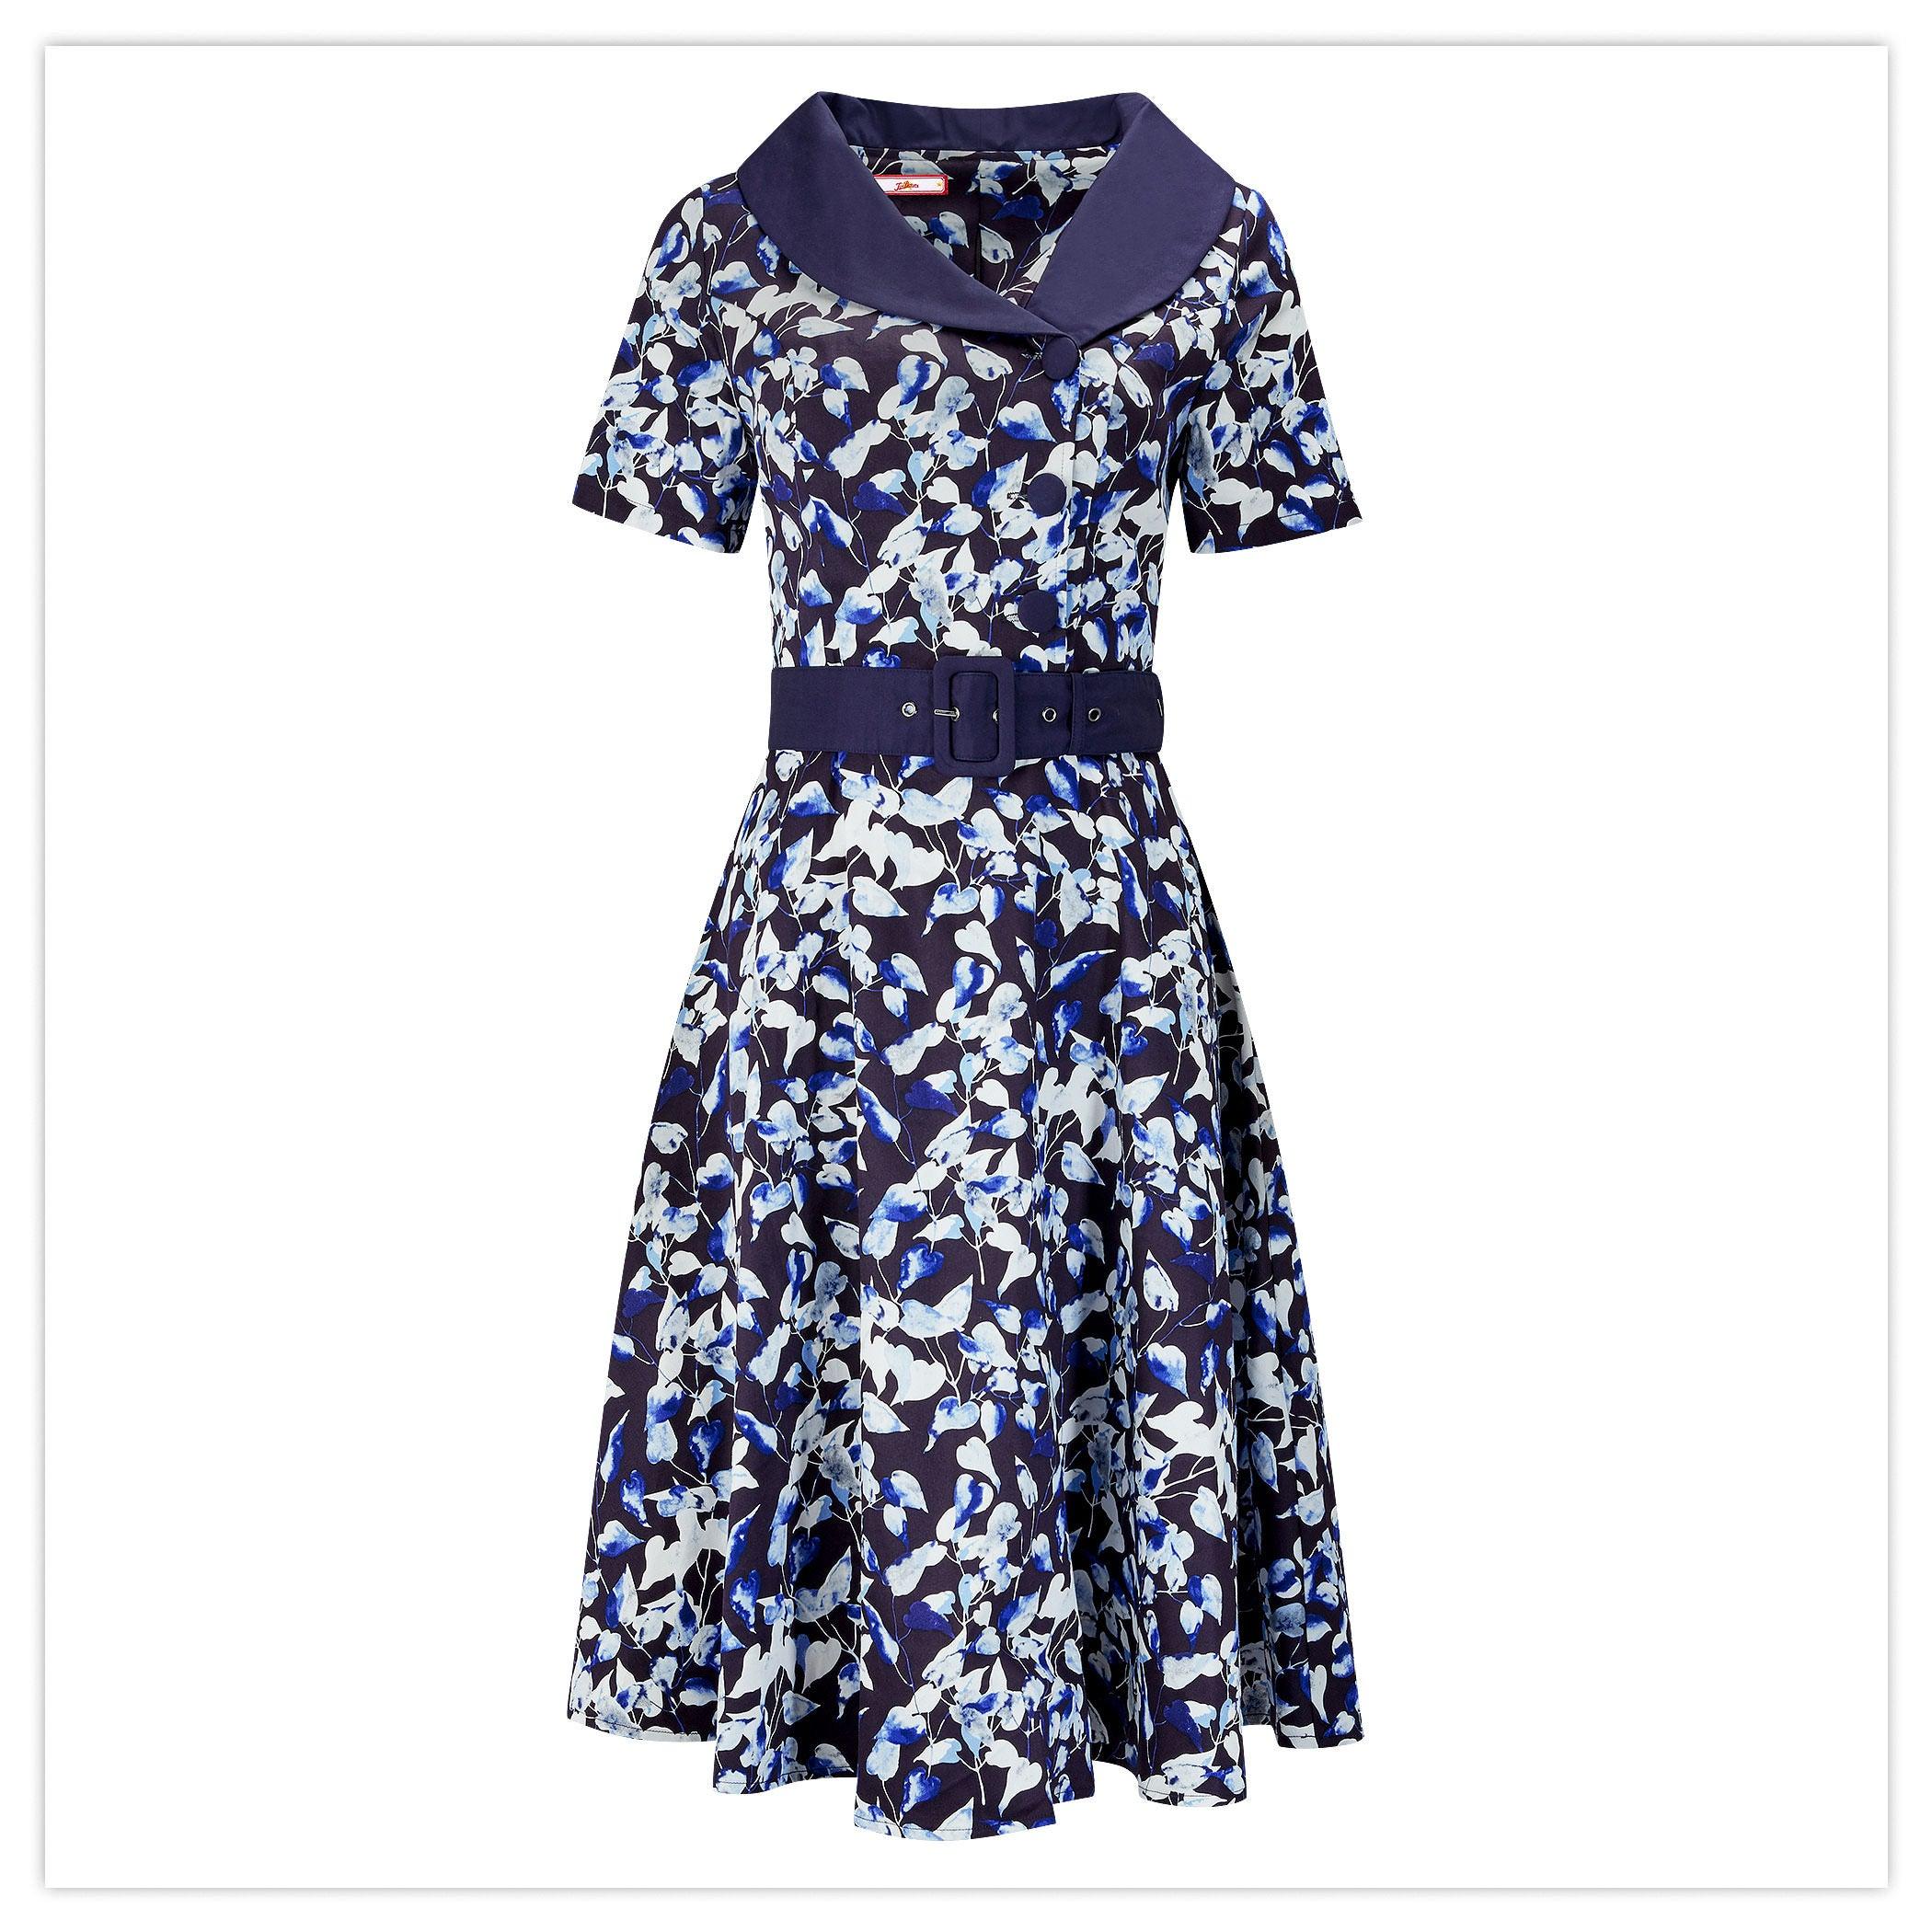 Retro Collar Dress